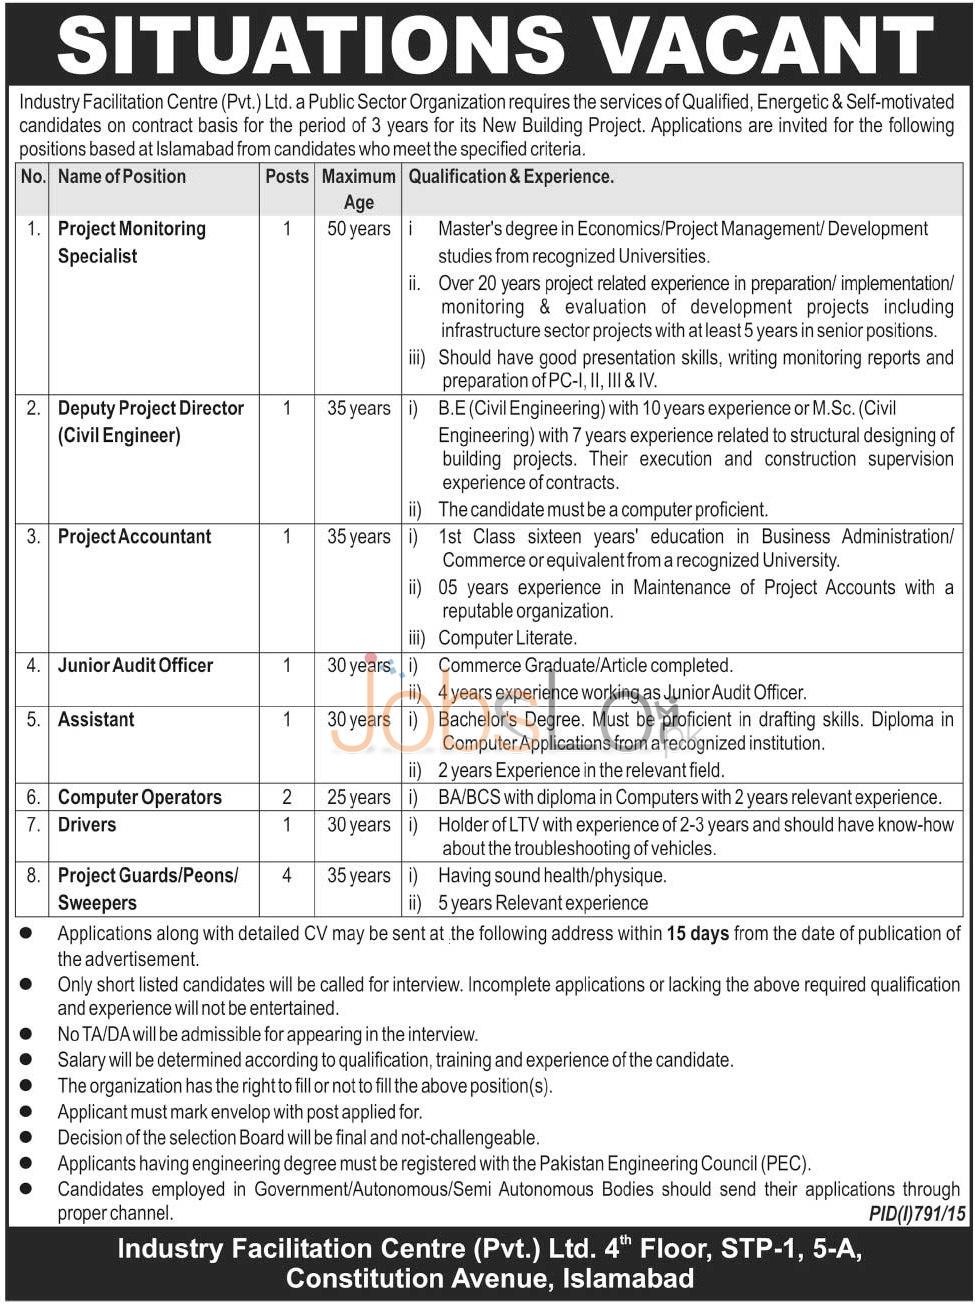 Industry Facilitation Centre Islamabad Jobs